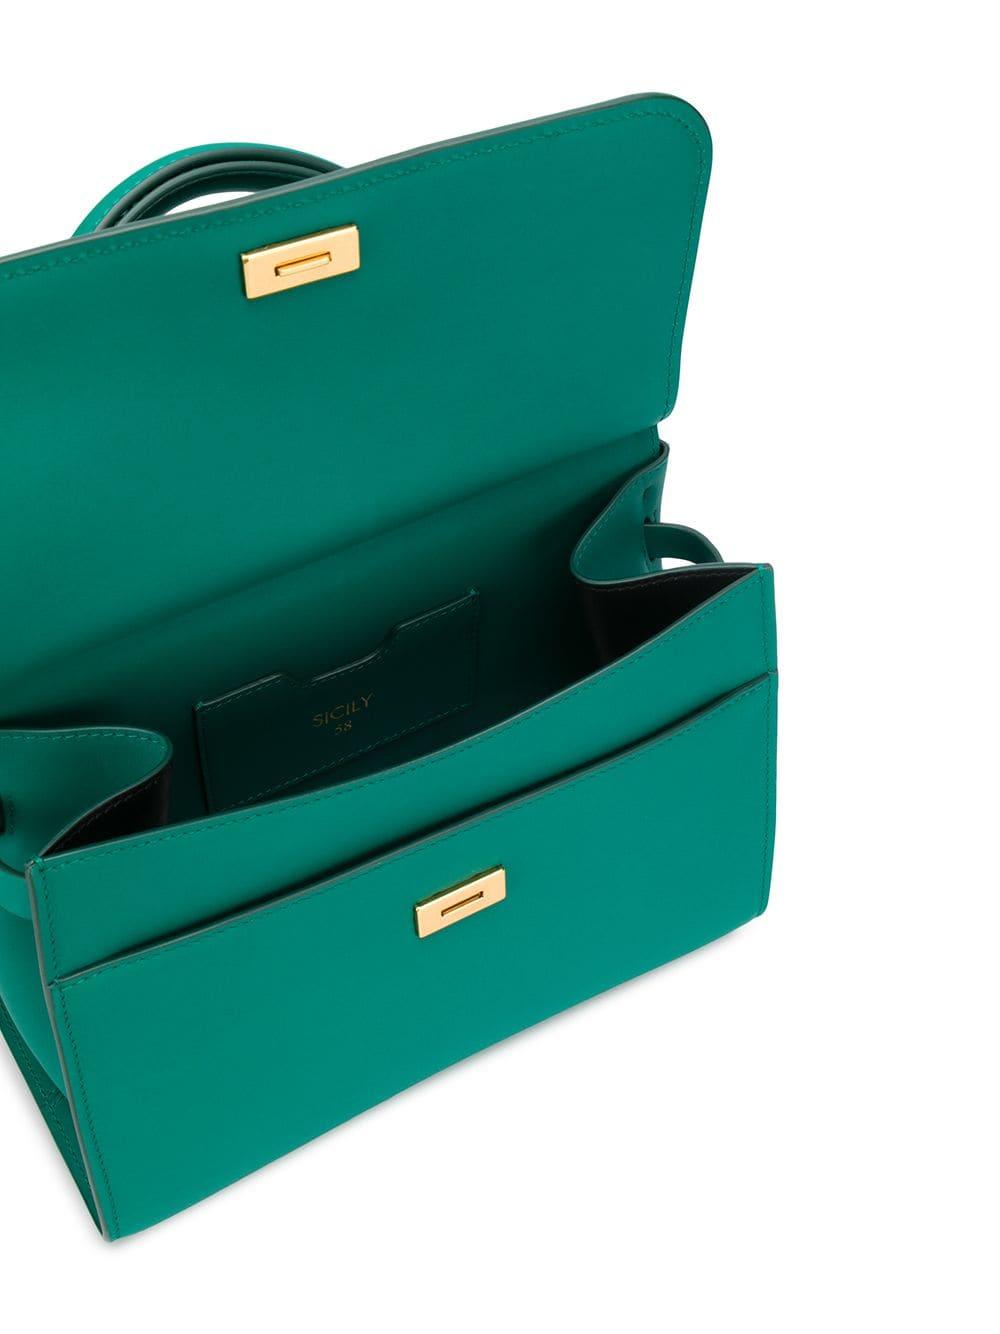 Sicily 58 calf leather emerald green tote bag DOLCE & GABBANA |  | BB6622-AV3858H544